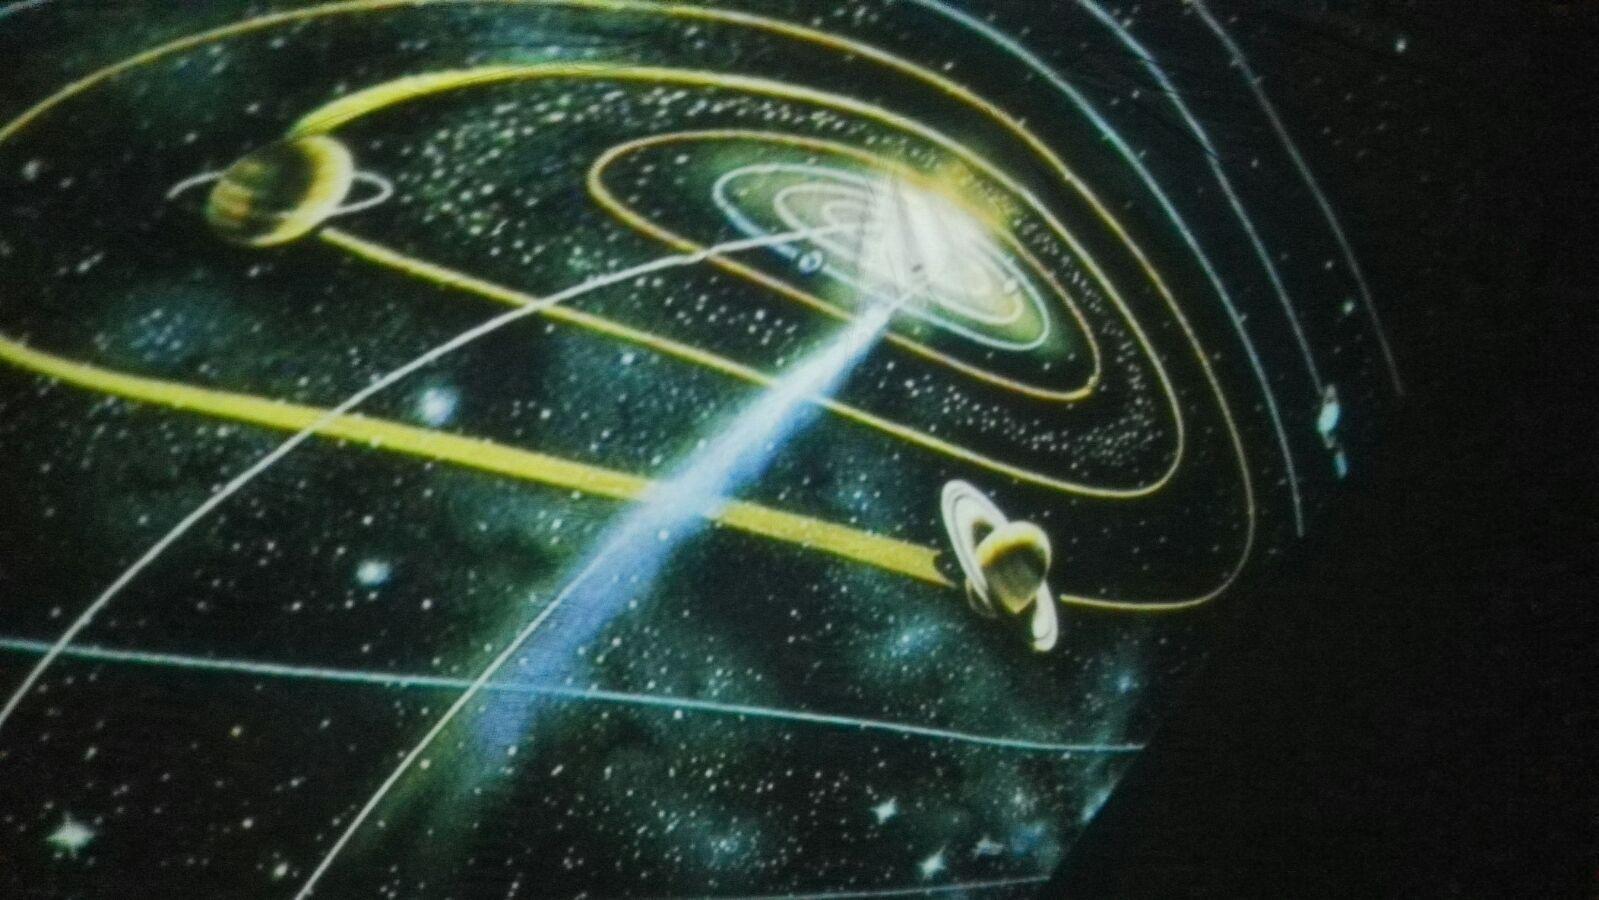 Planetario_Inf 5A_CEIP Fdlr_Las Rozas 7